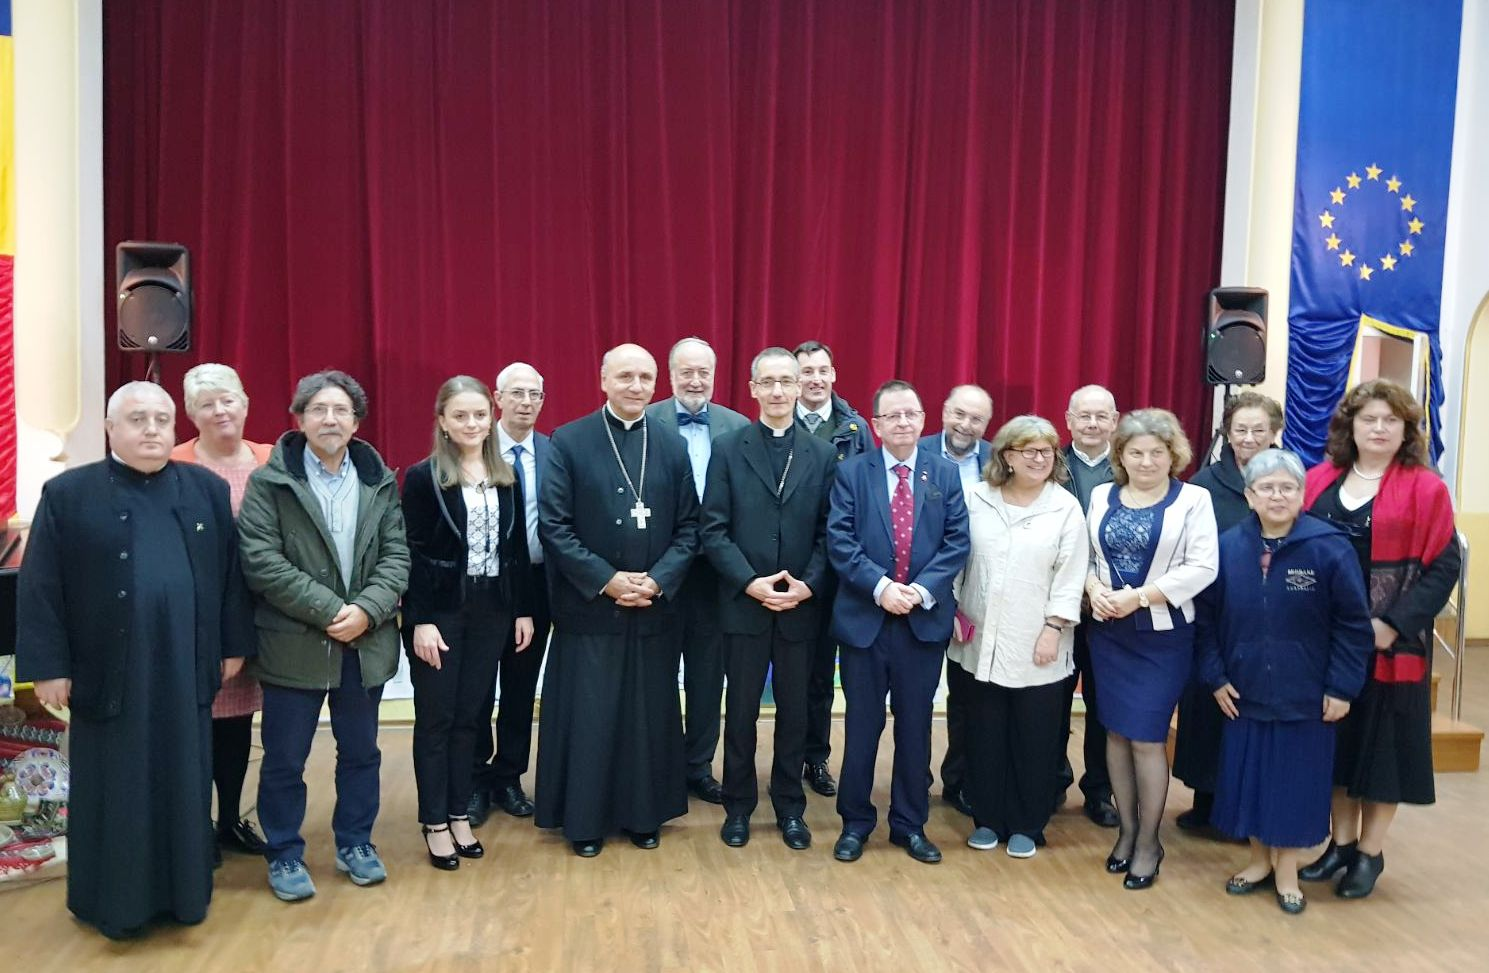 UMEC-WUCT - Council 2017 - Oradea